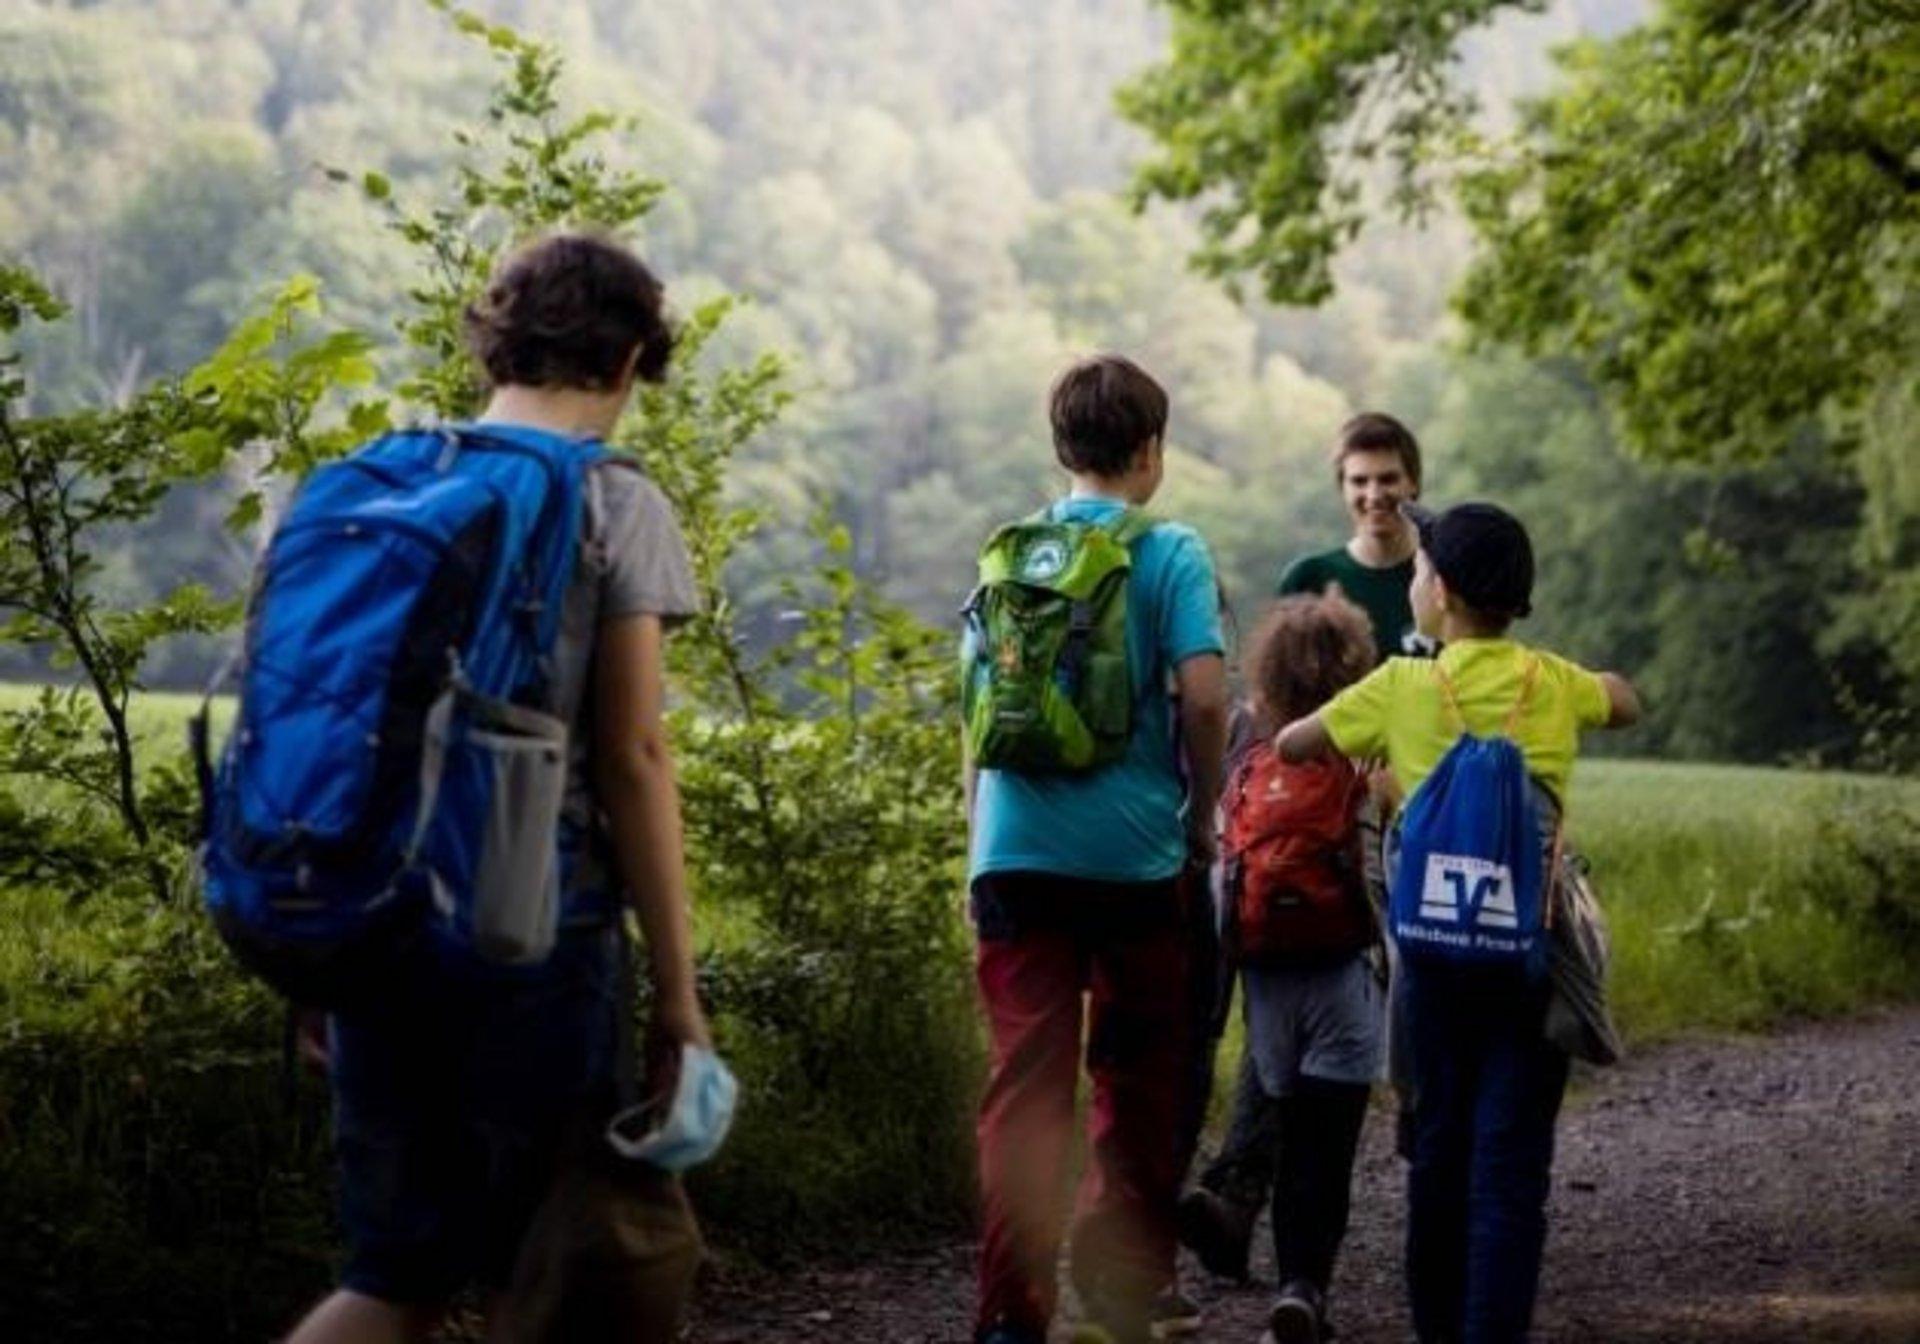 Kinder bei Waldjugendspielen (Foto Thabea Mundt)